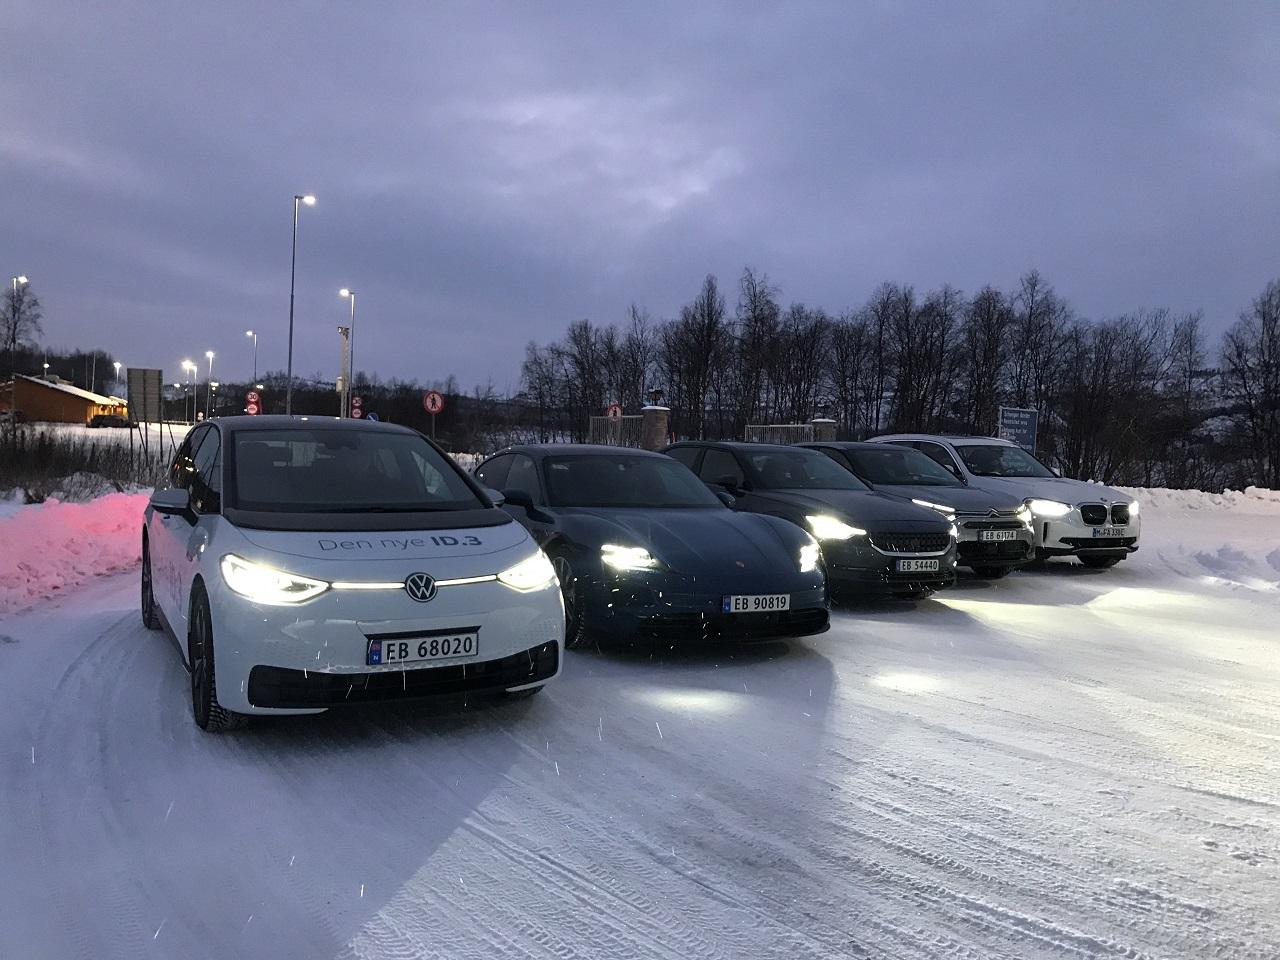 Elbiltest - Nord-Norge - Vinteren 2021 - Norsk elbilforening